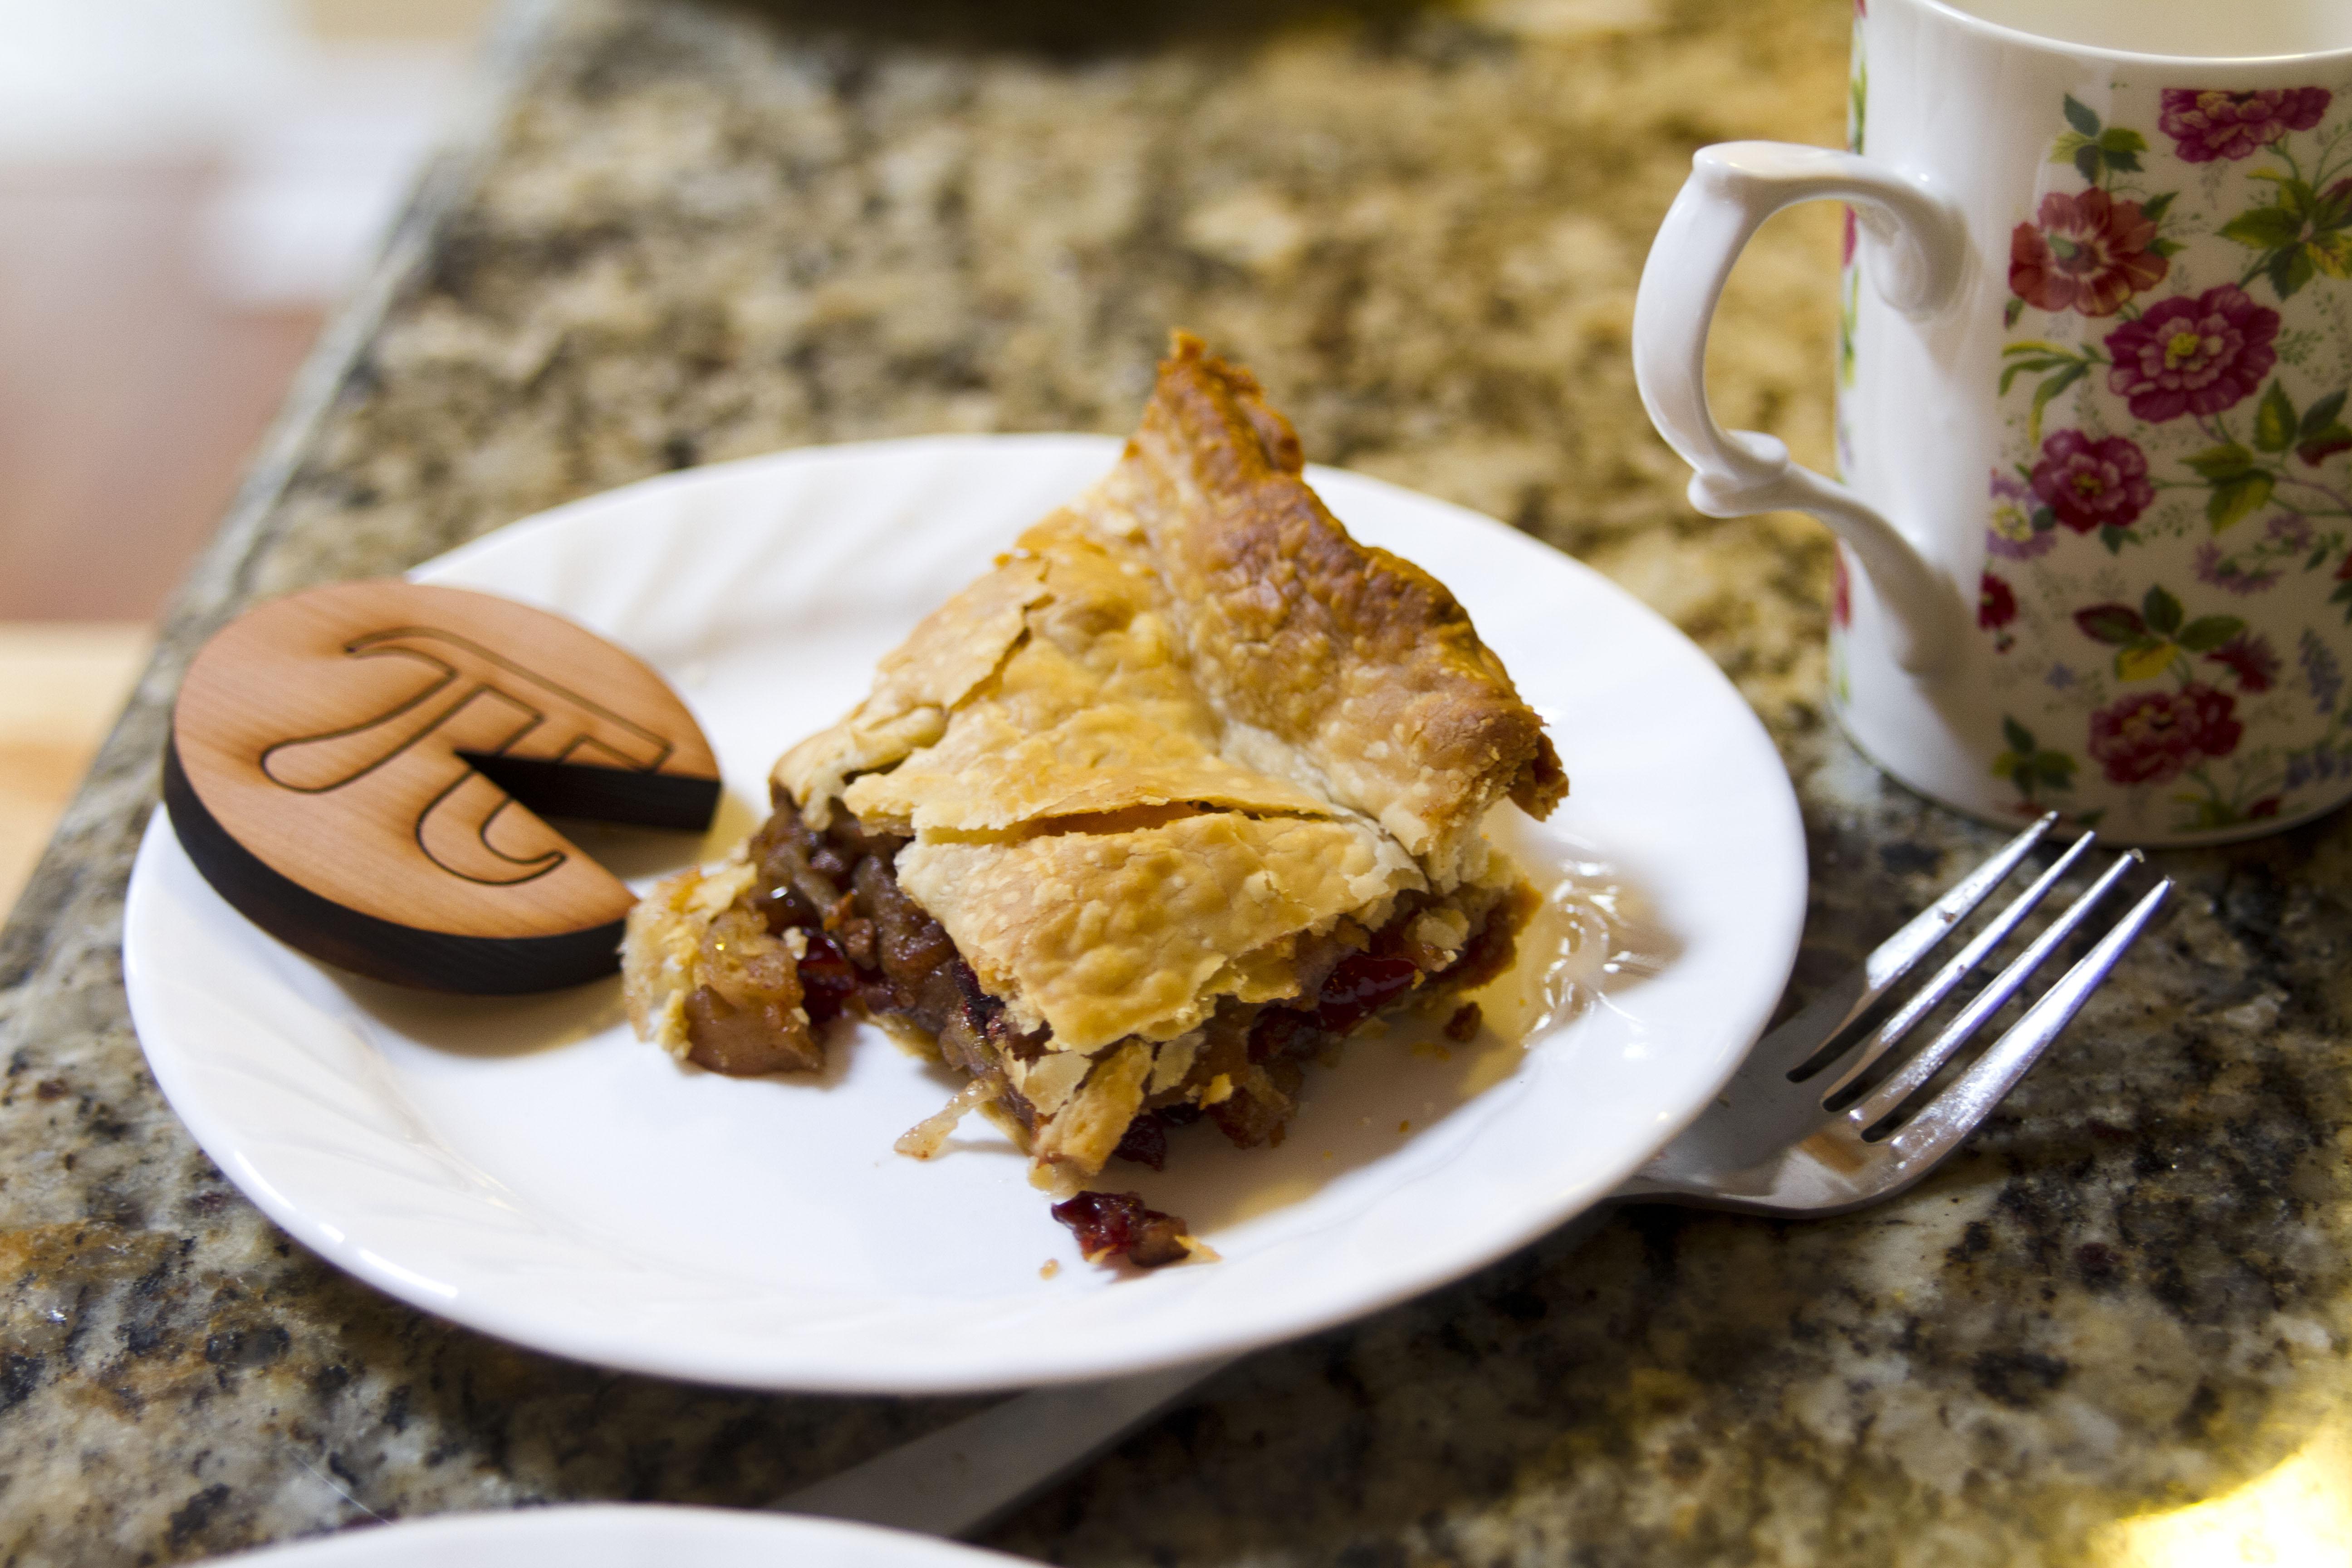 A Slice of Cranberry Apple (Pi) Pie